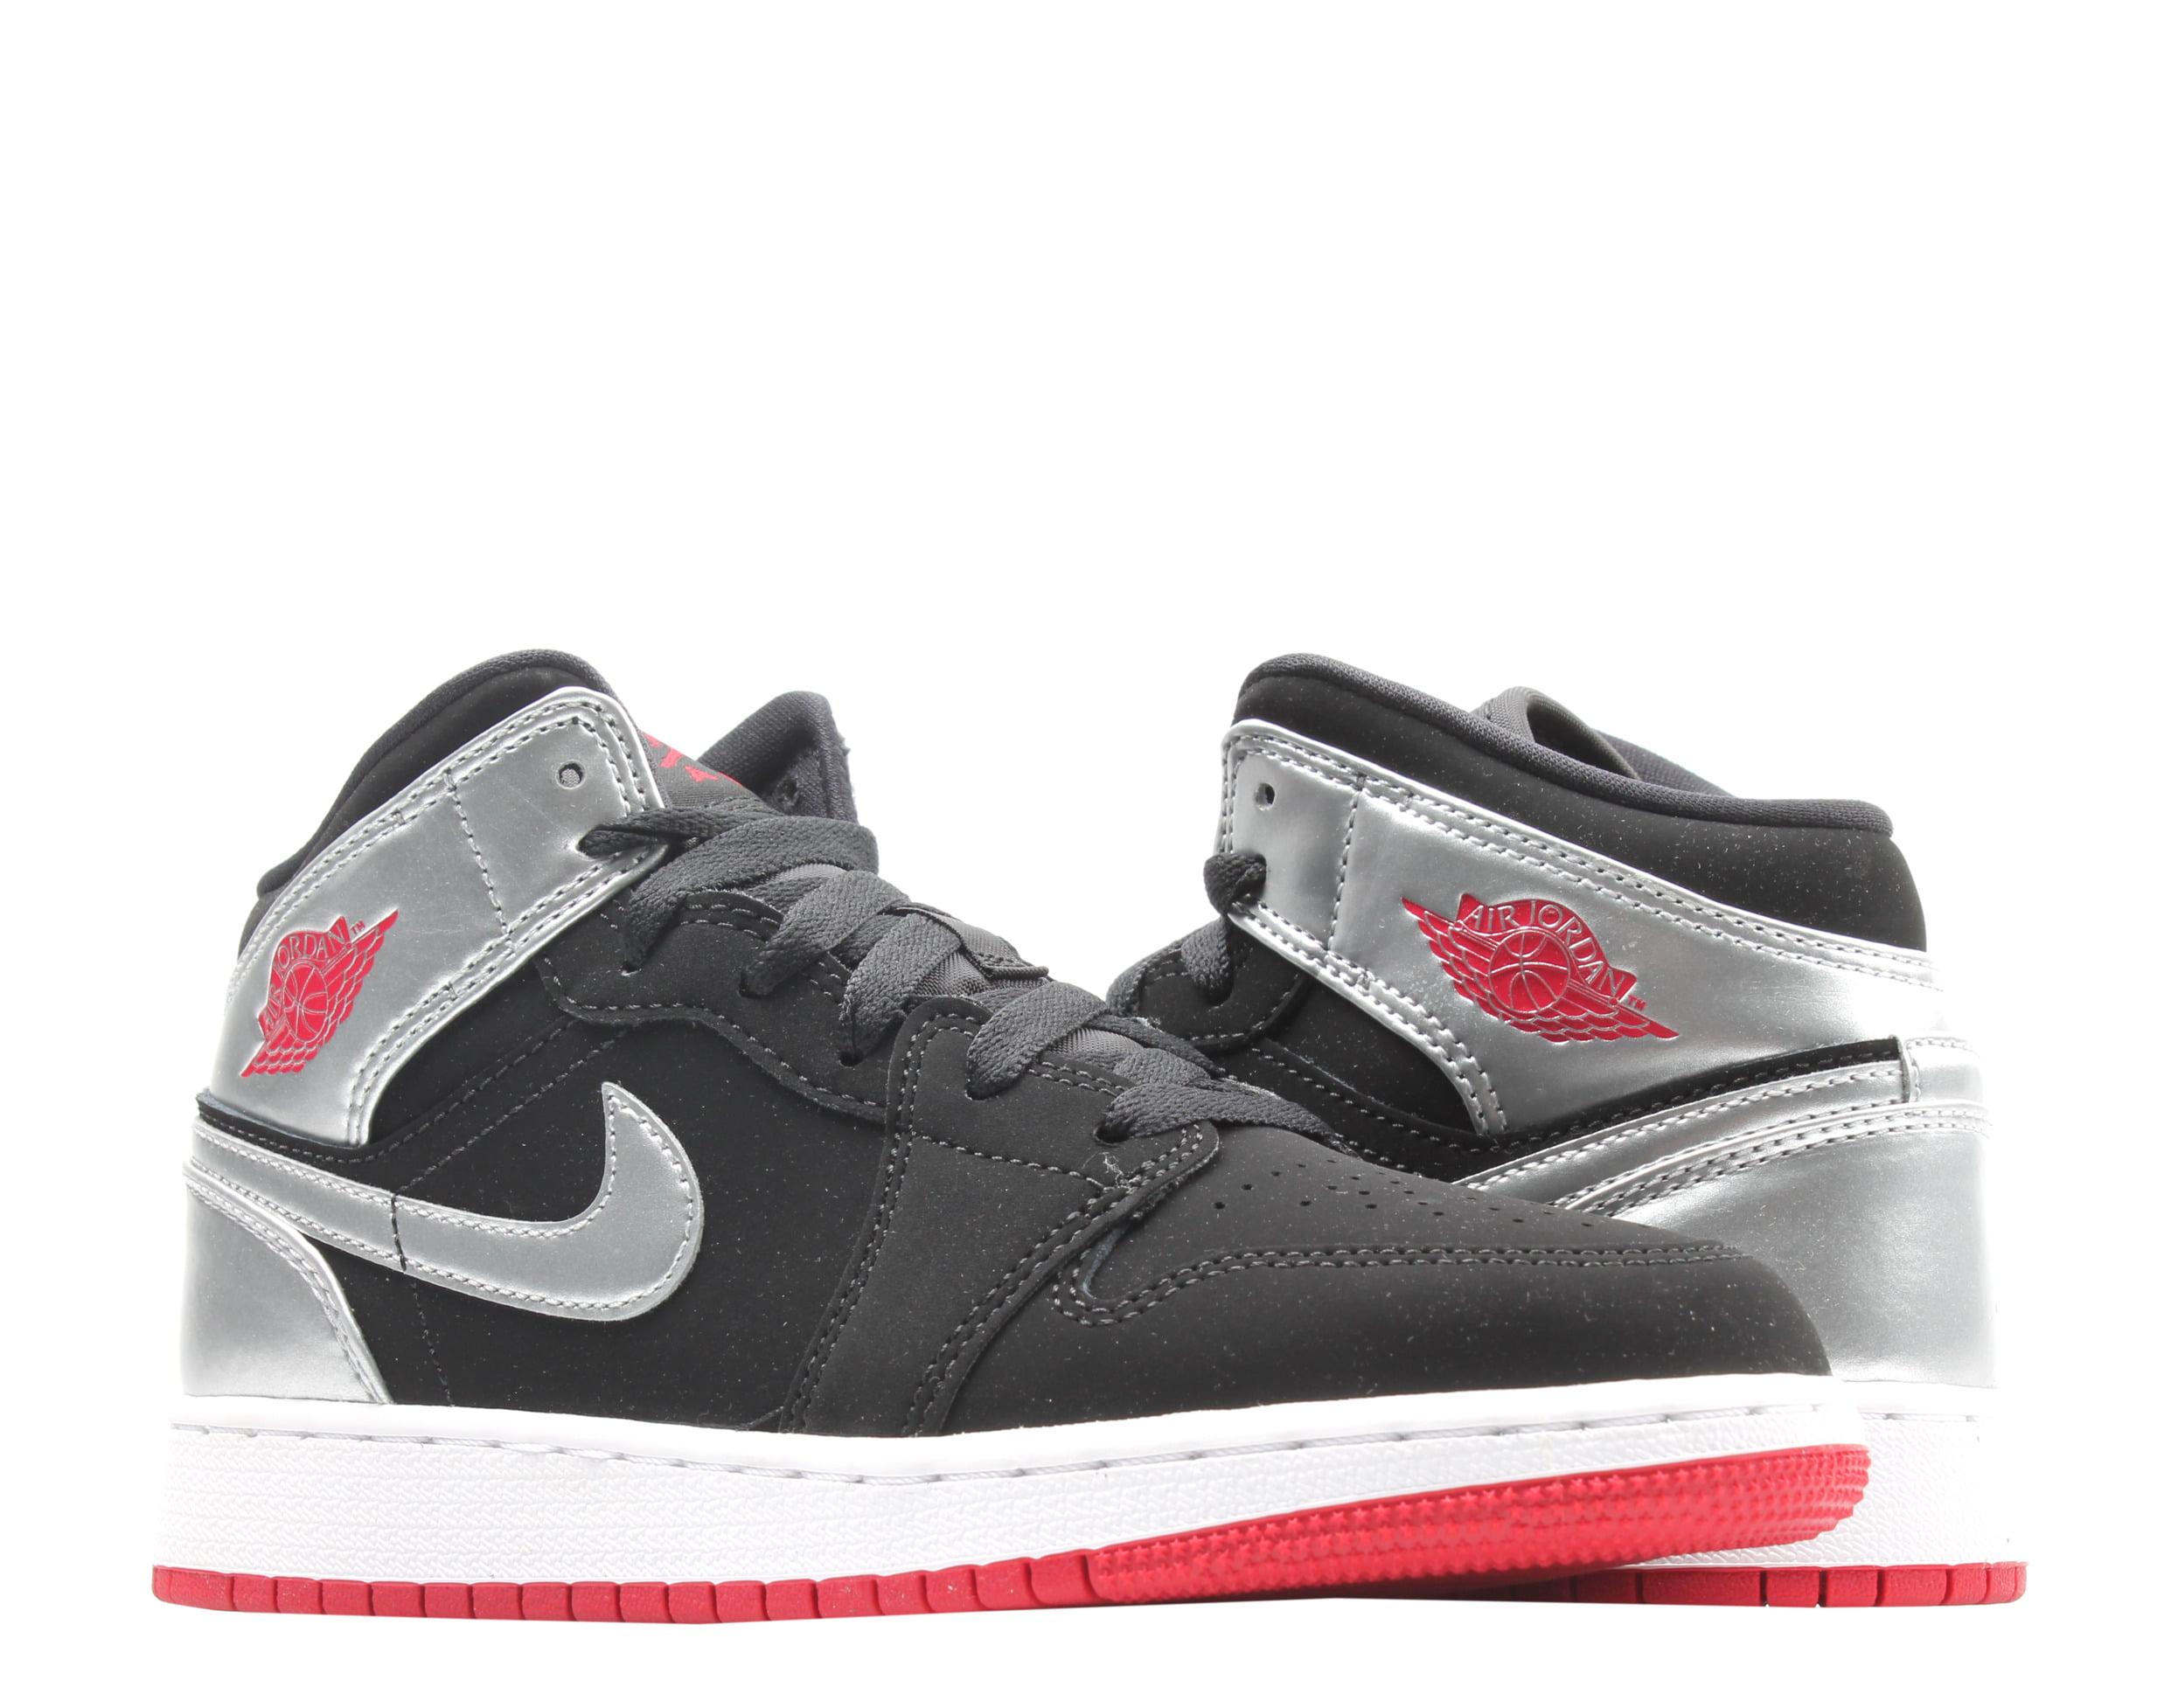 Jordan - Nike Air Jordan 1 Mid (GS) Big Kids Basketball Shoes Size 6.5 - Walmart.com